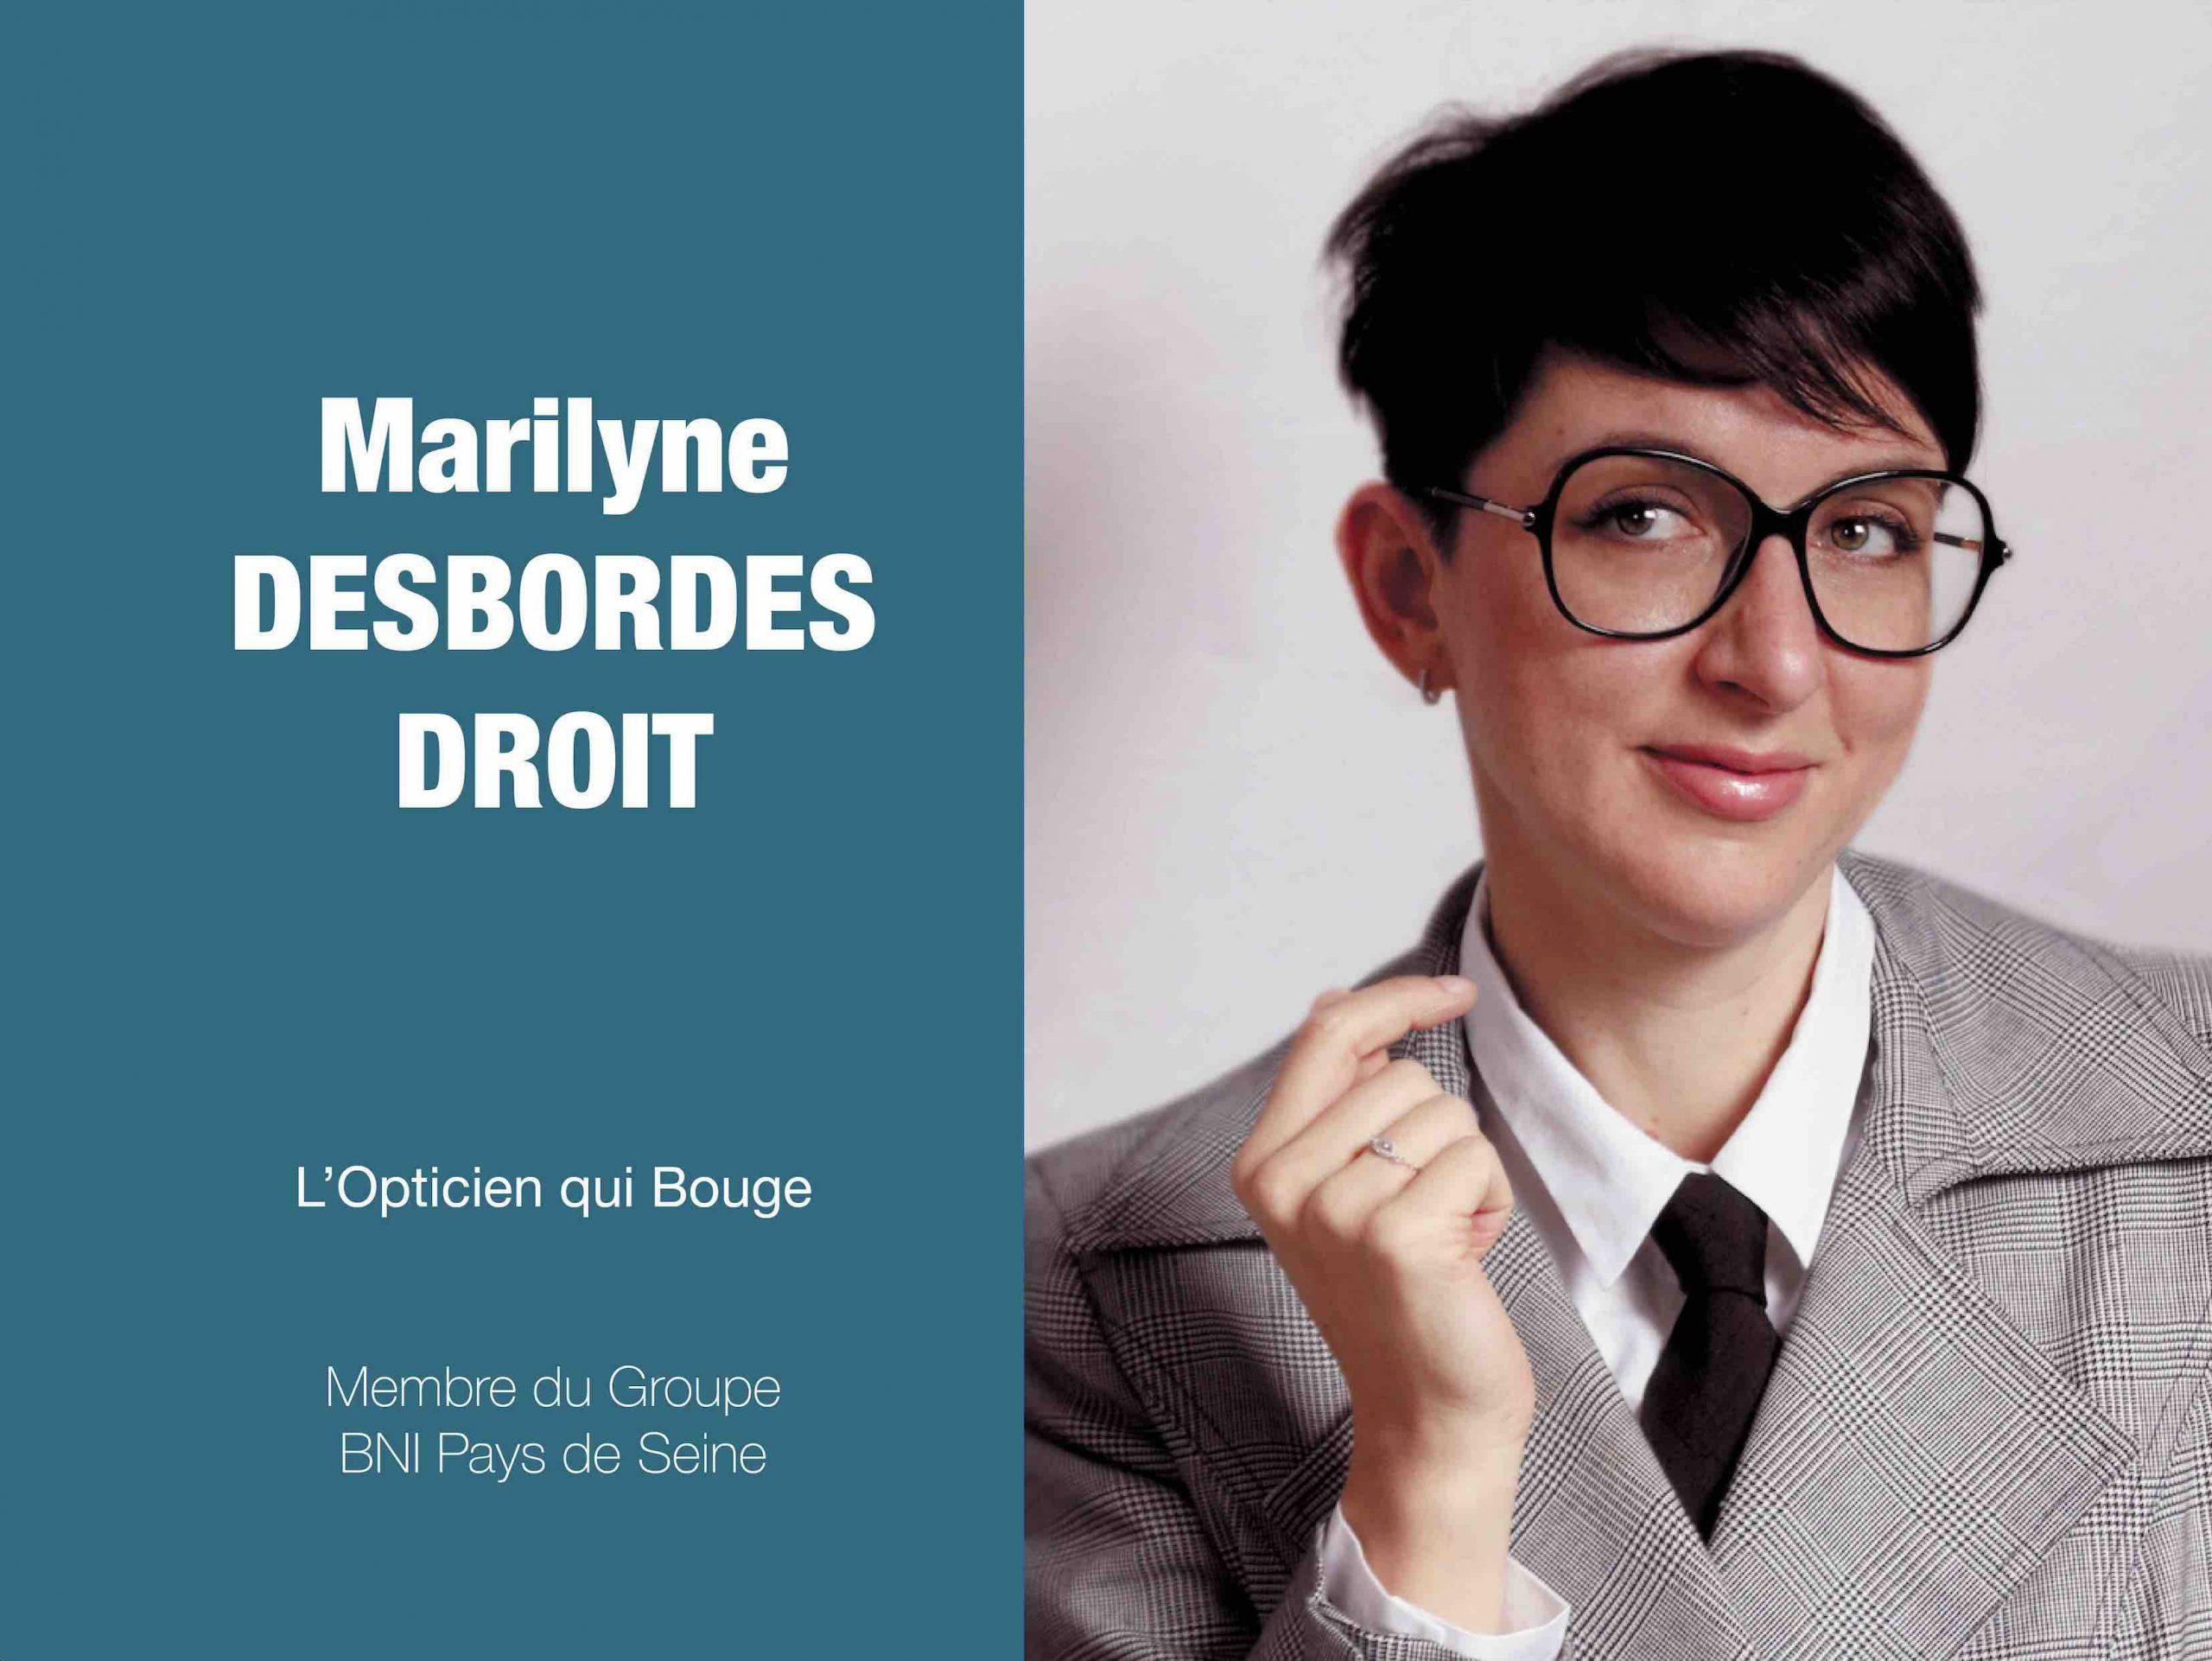 maryline-desborbes-opticien-bni-pays-de-seine